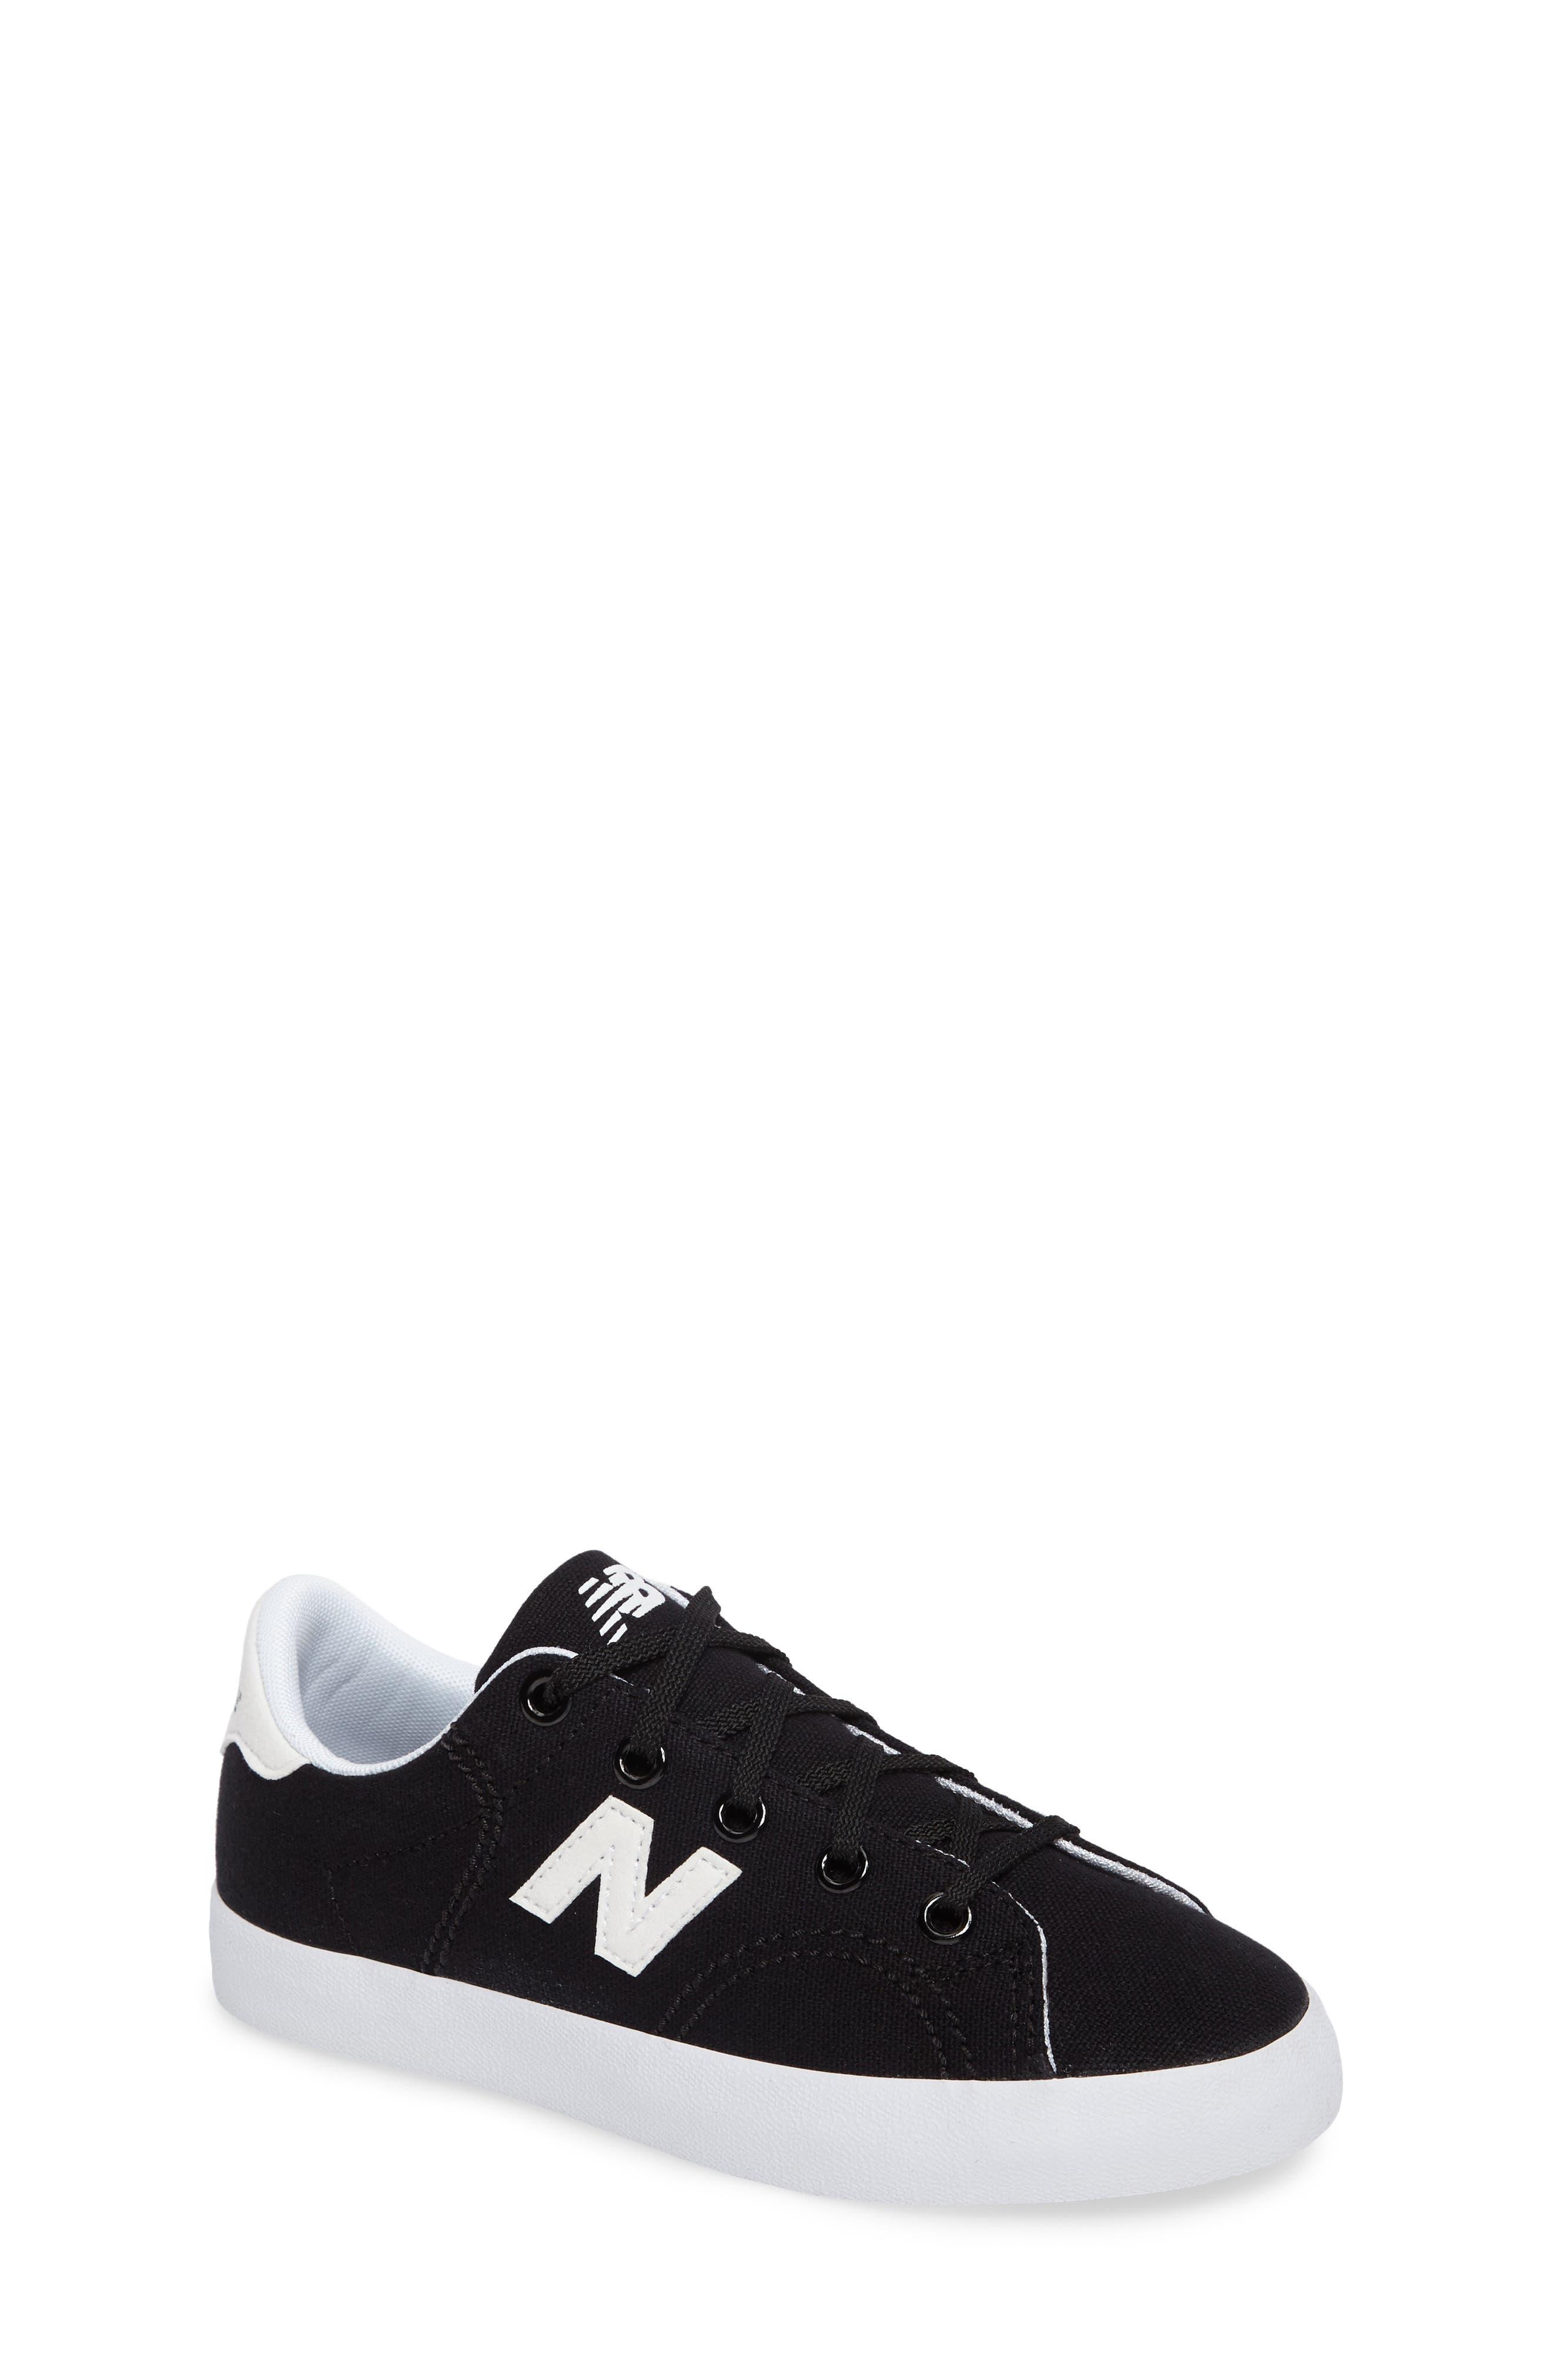 Main Image - New Balance Pro Court Sneaker (Toddler, Little Kid & Big Kid)